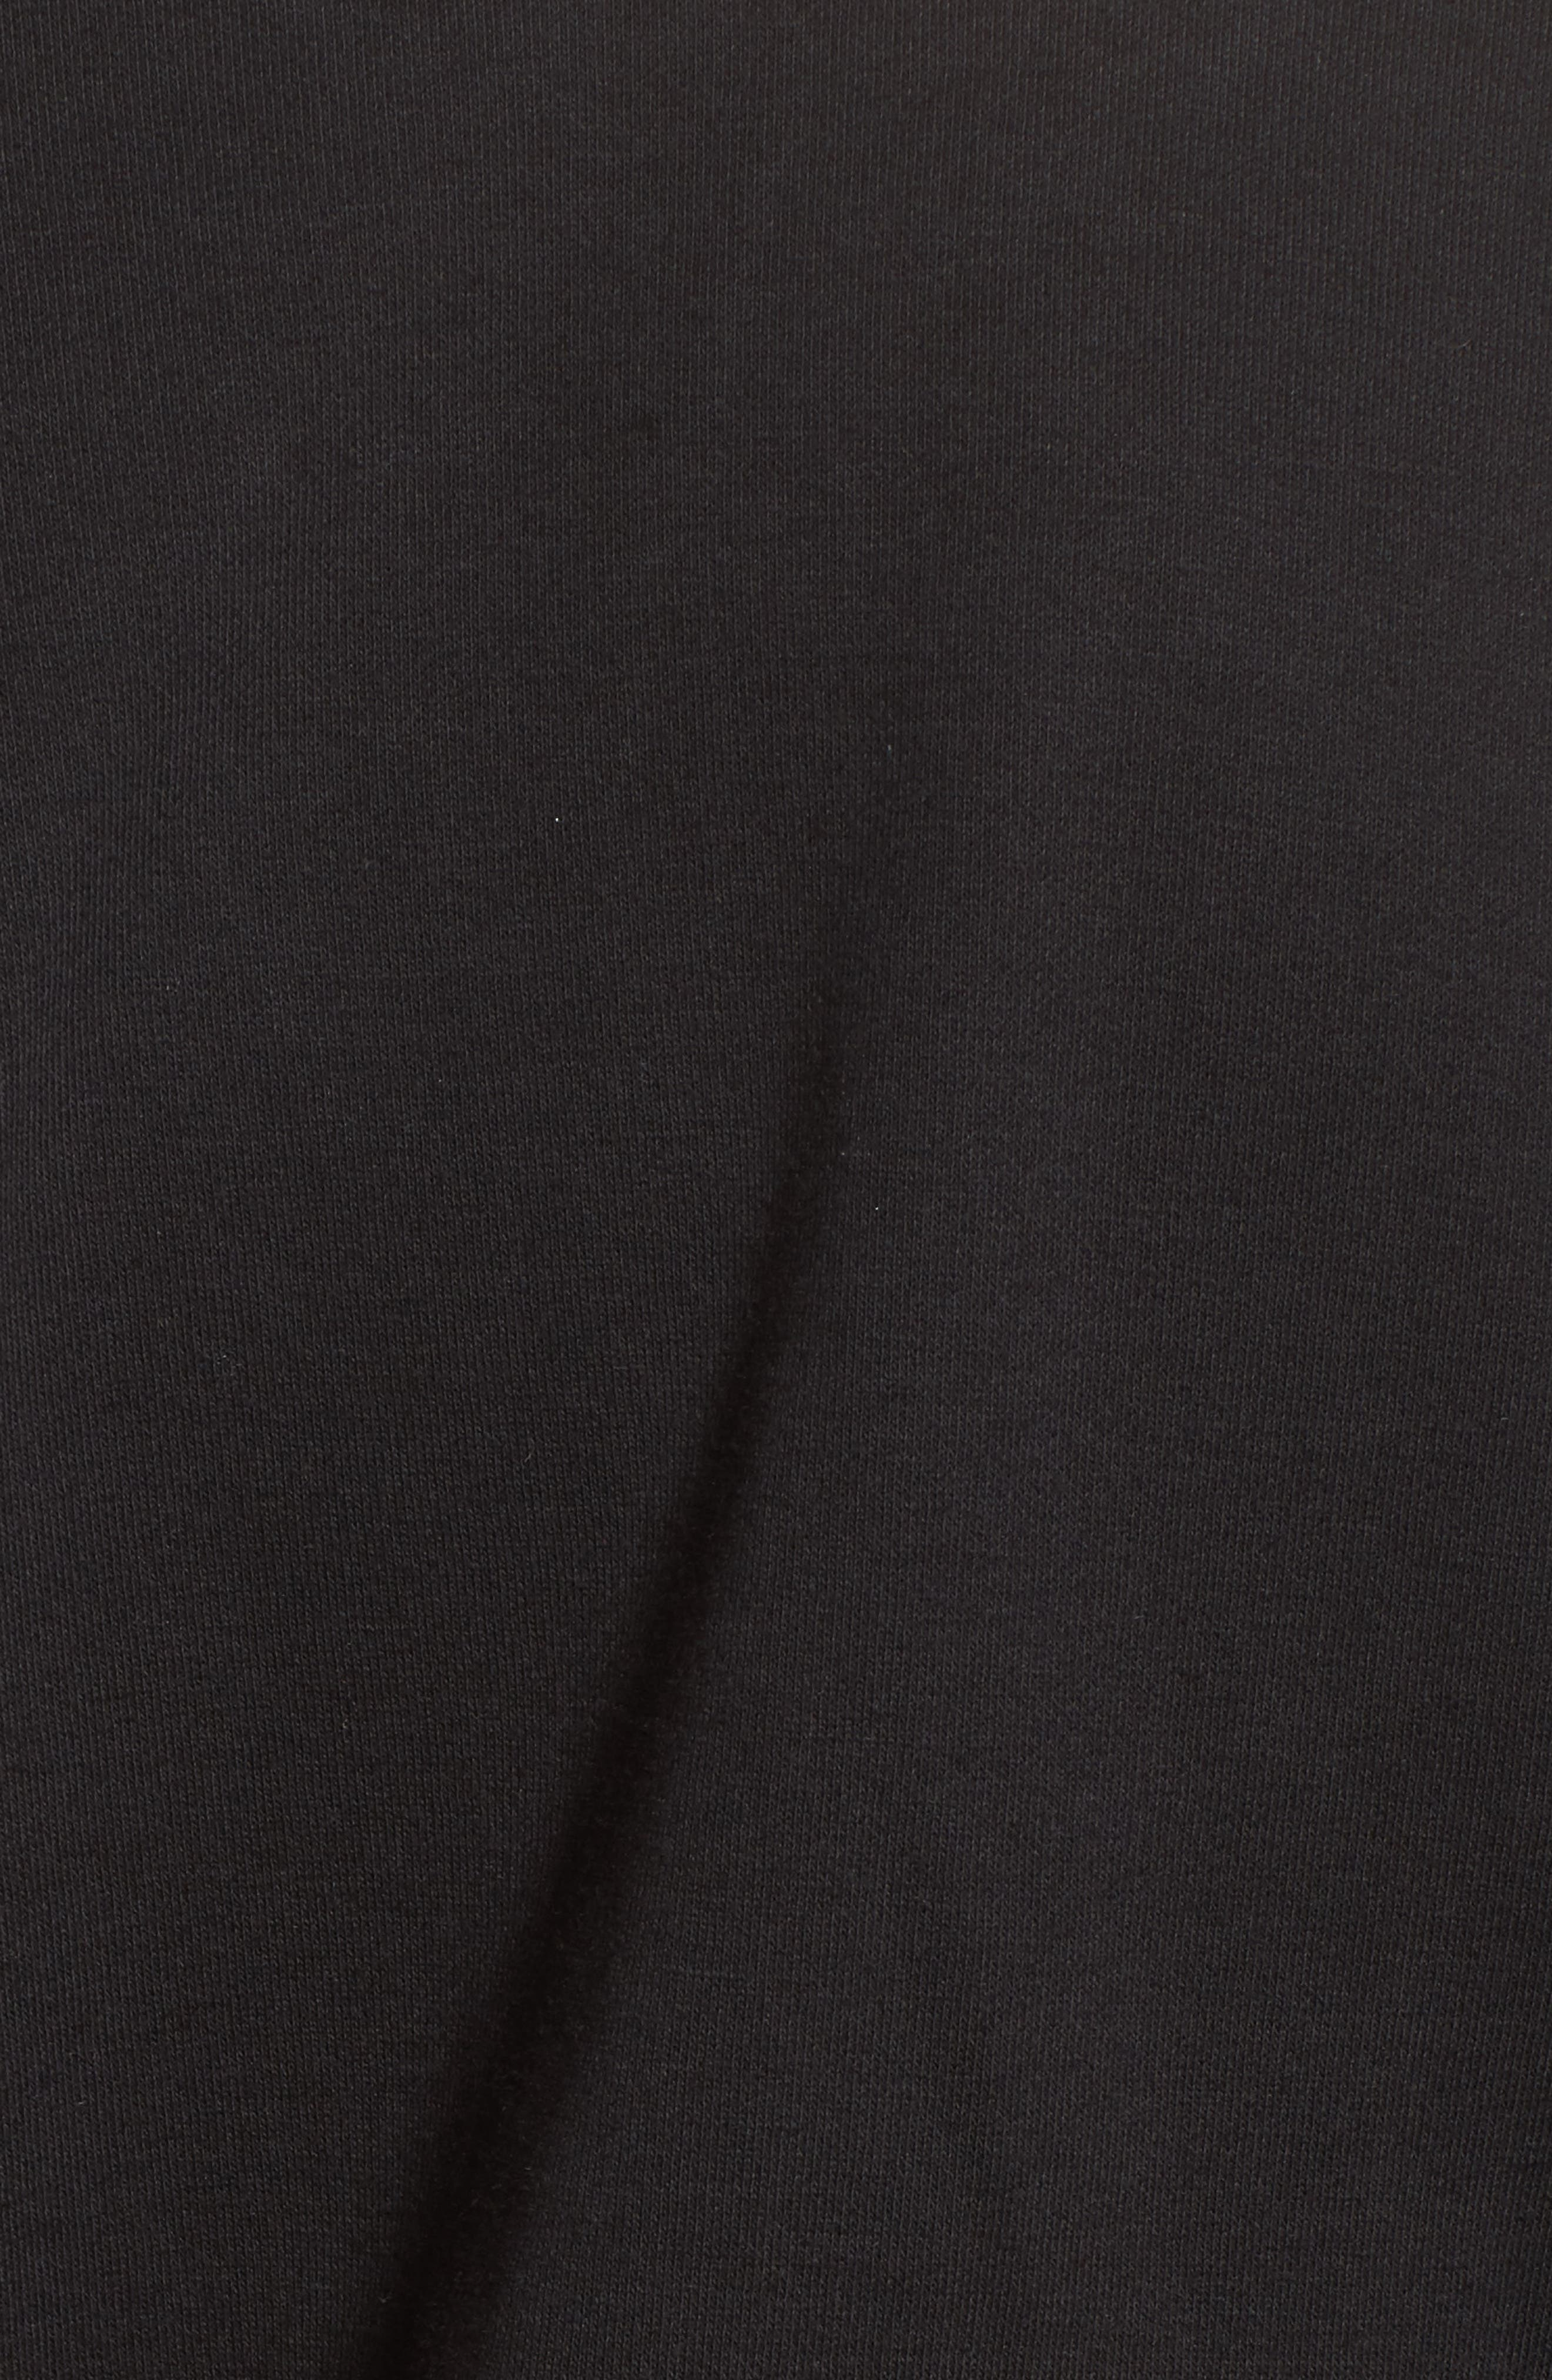 Blouson Sleeve Sweatshirt,                             Alternate thumbnail 5, color,                             001